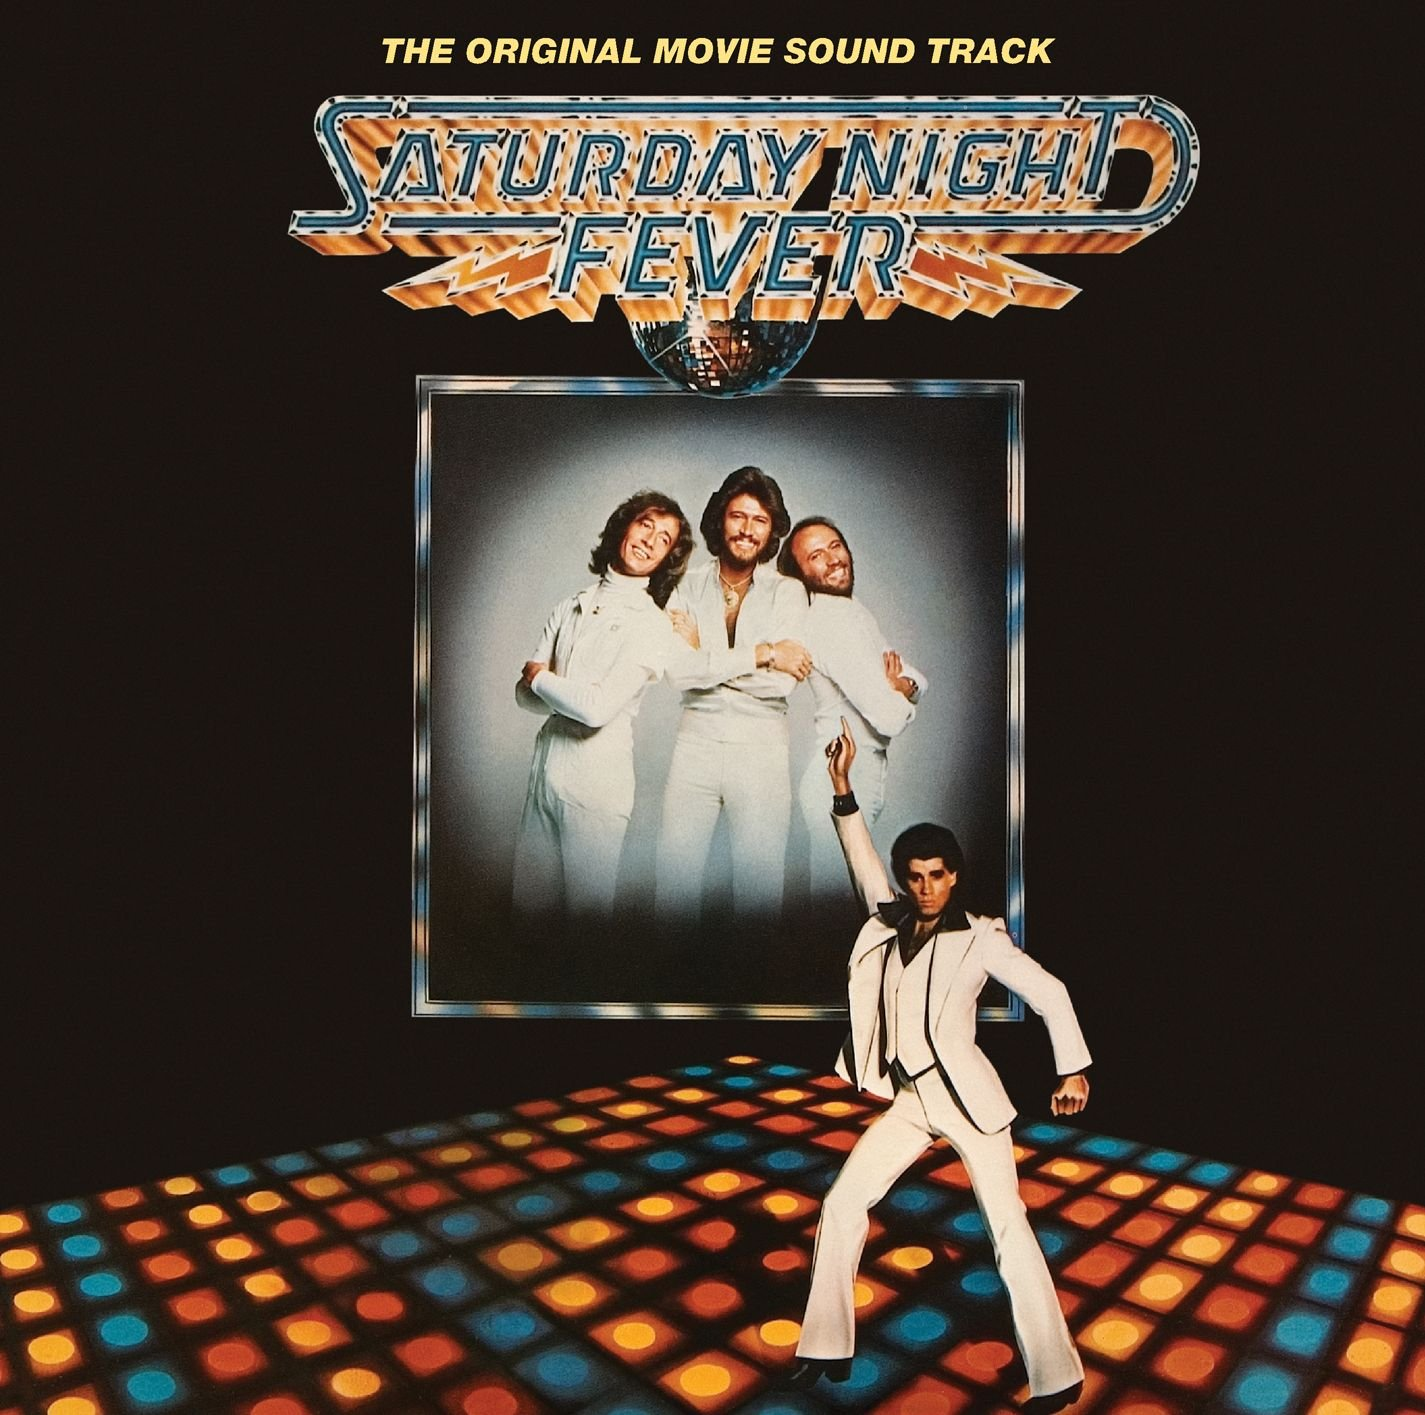 Saturday Night Fever/The Original Movie Soundtrack